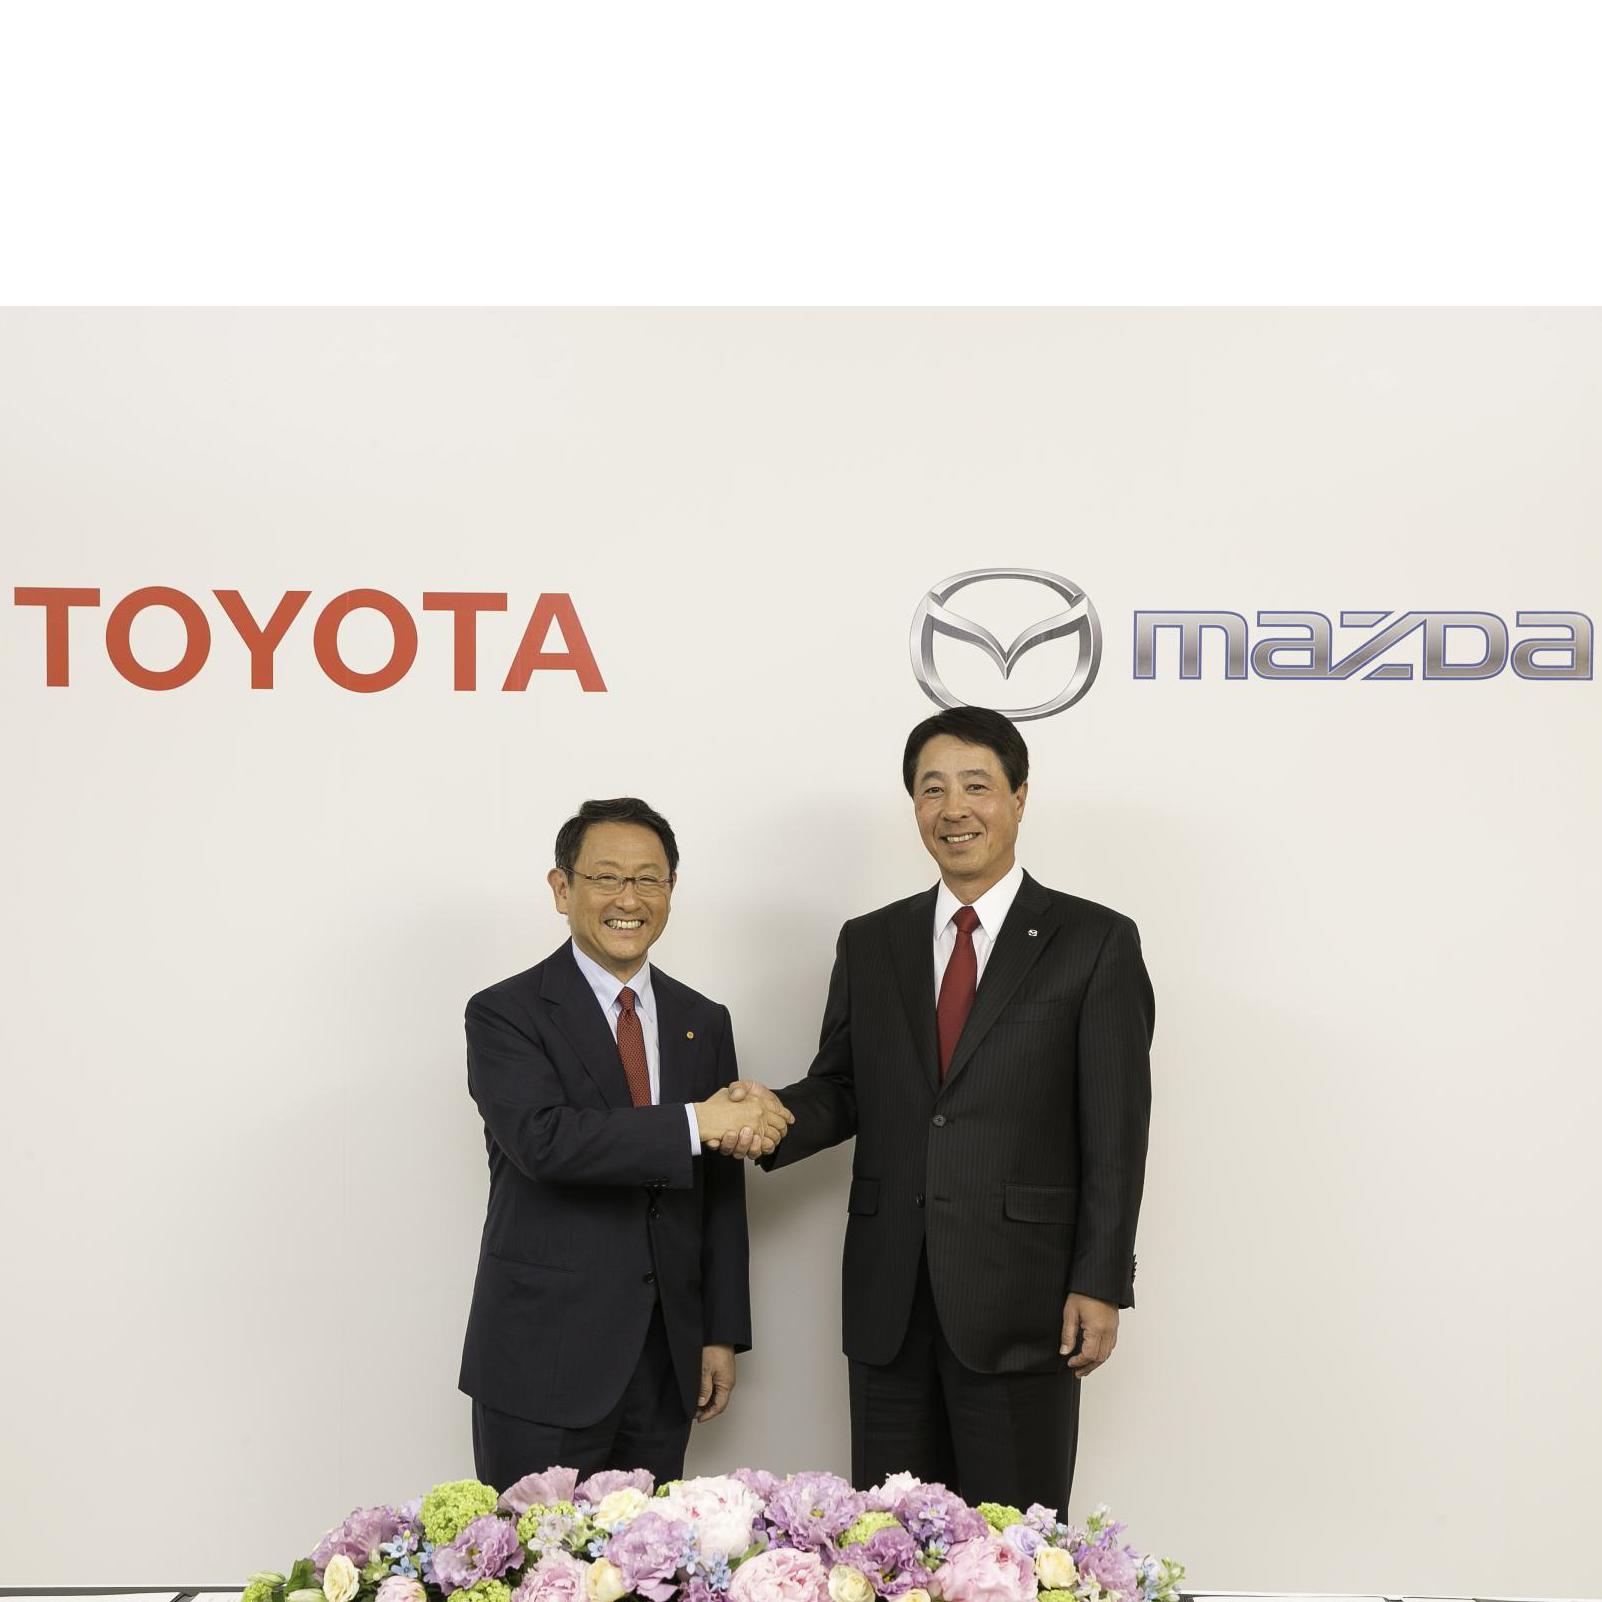 Toyota-Auris-Hybrid-Touring-fleet-news